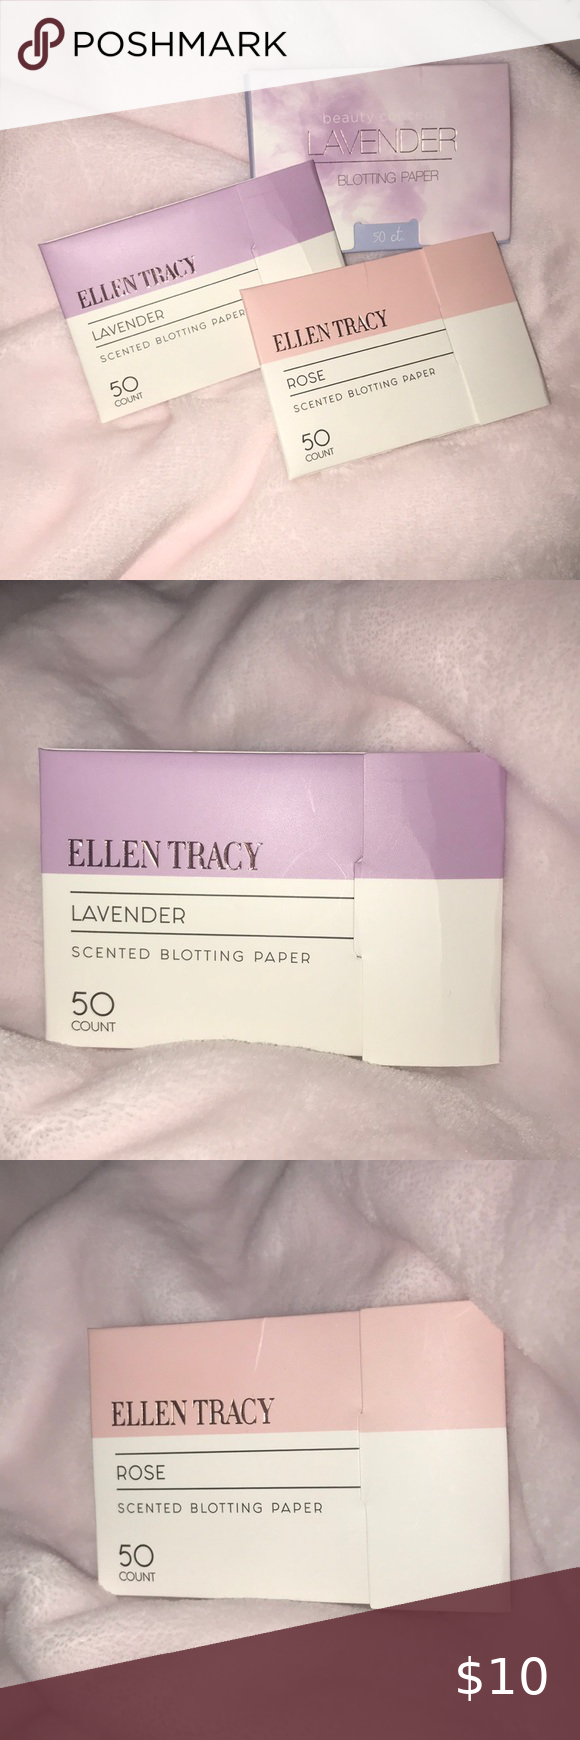 Beauty Concepts Ellen Tracy Blotting Paper Set In 2020 Ellen Tracy Makeup Blotting Paper Tracy Rose